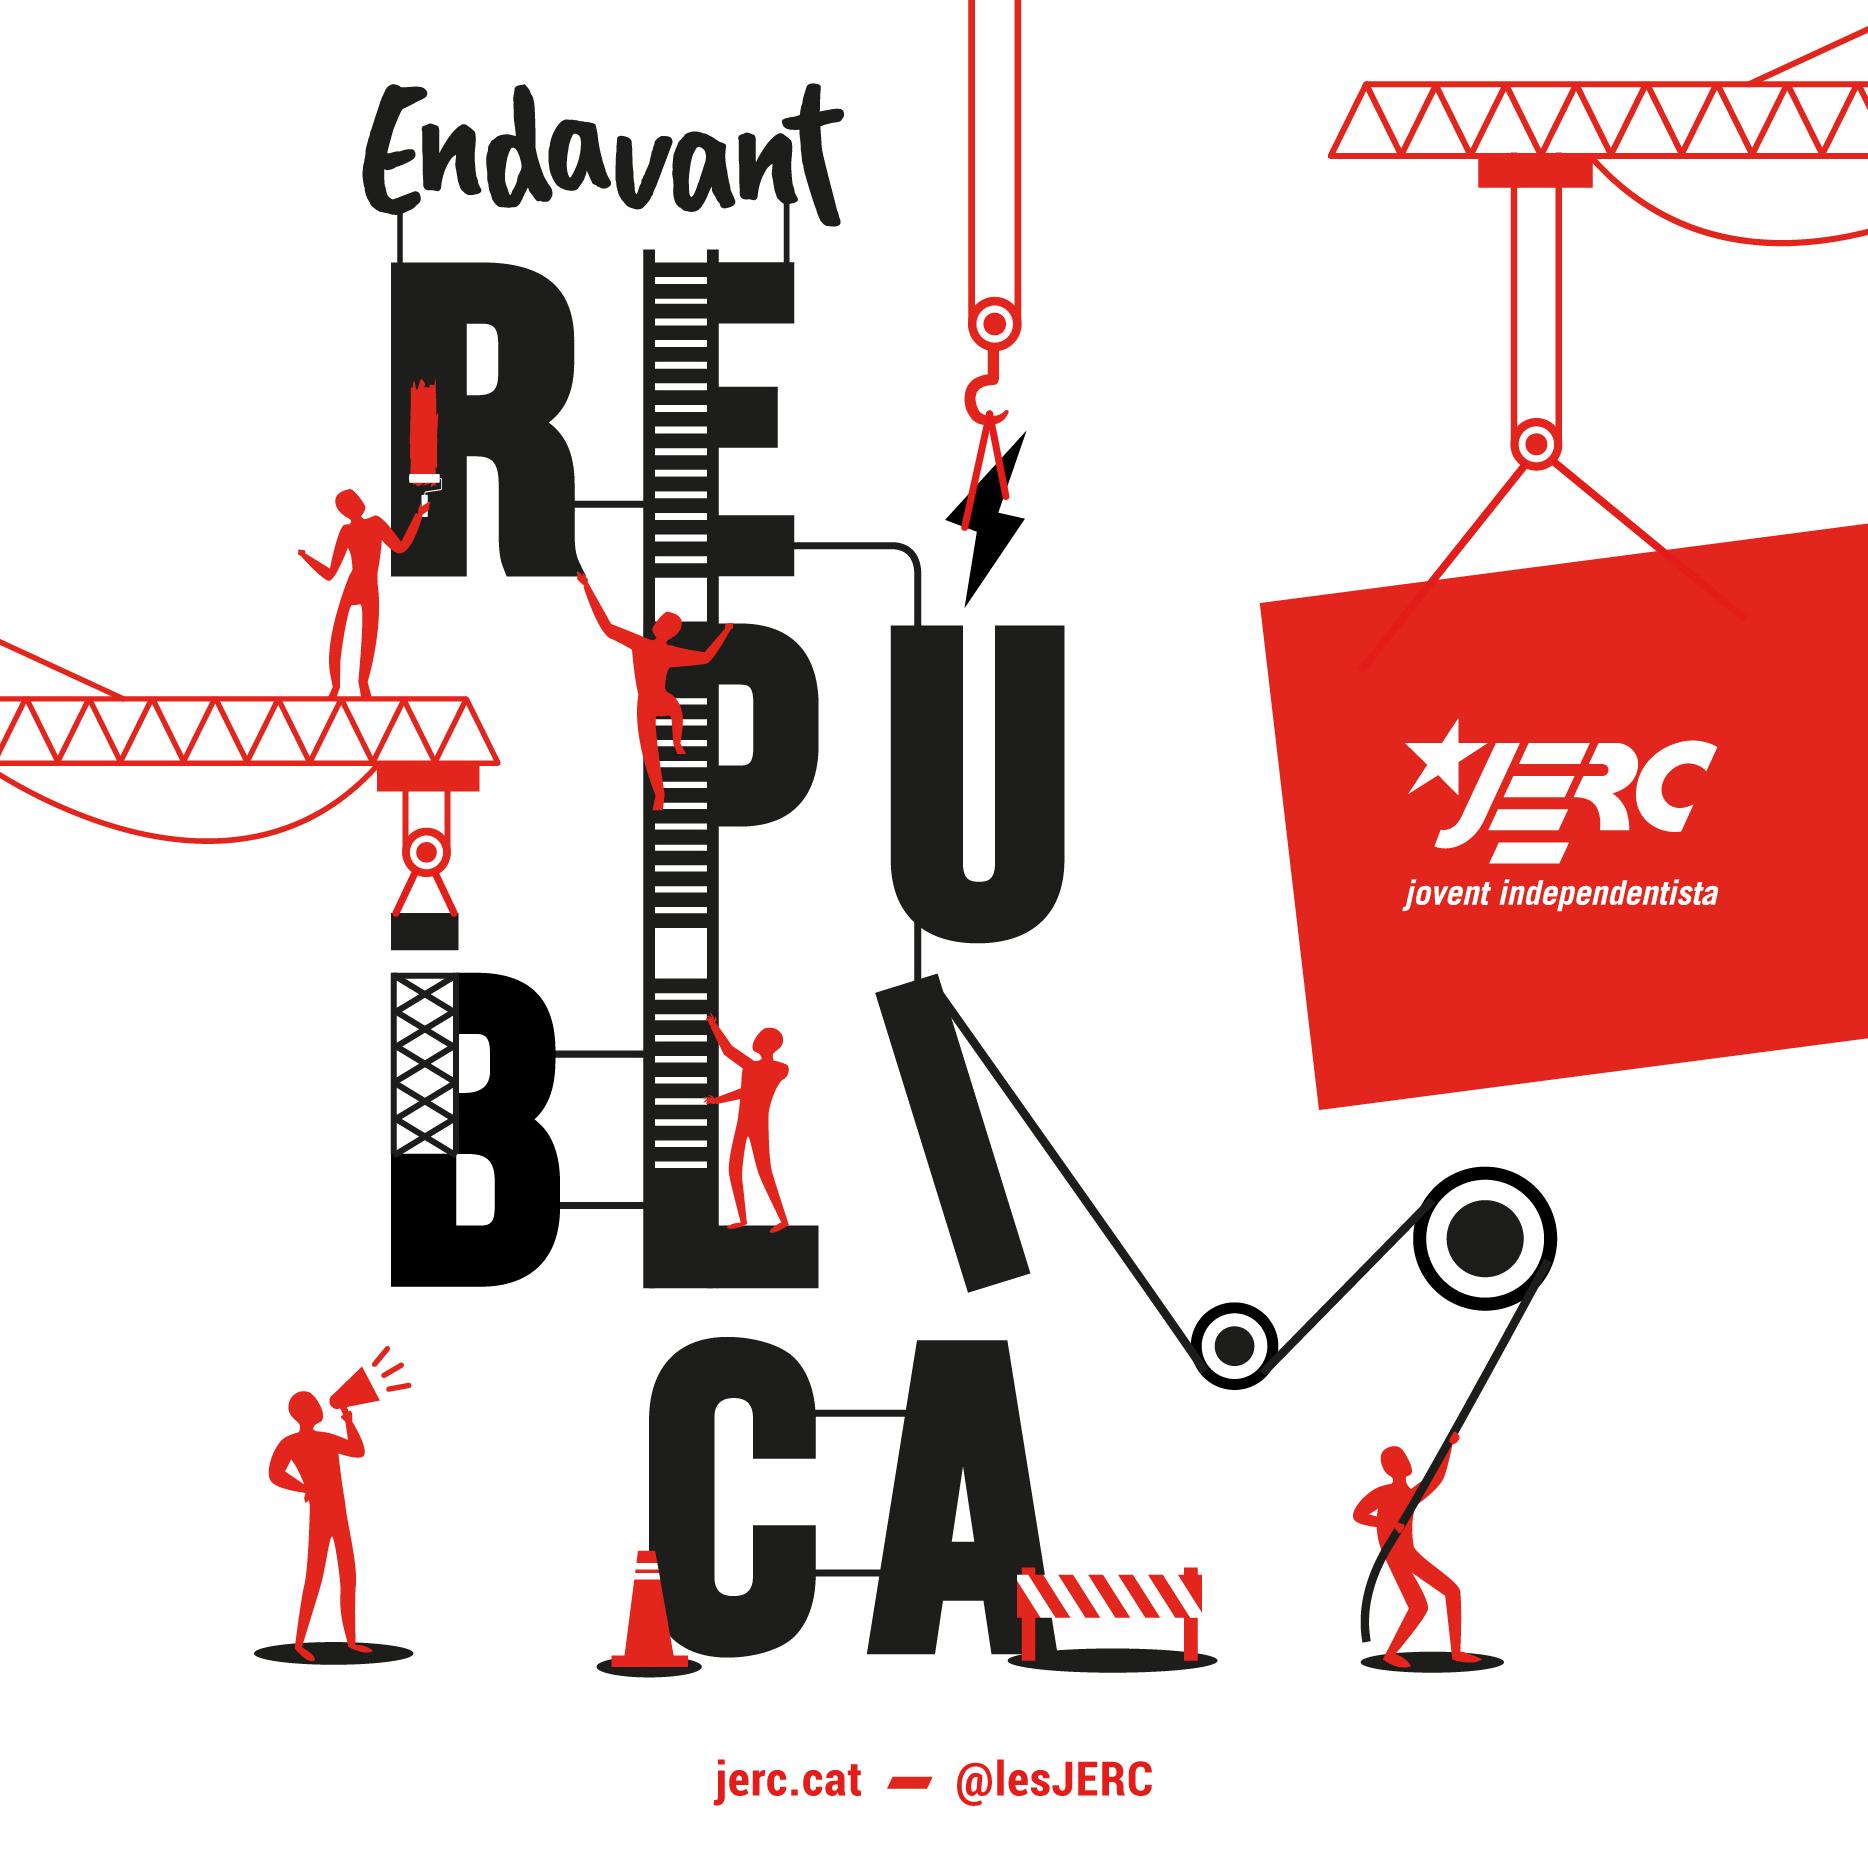 #EndavantRepública!